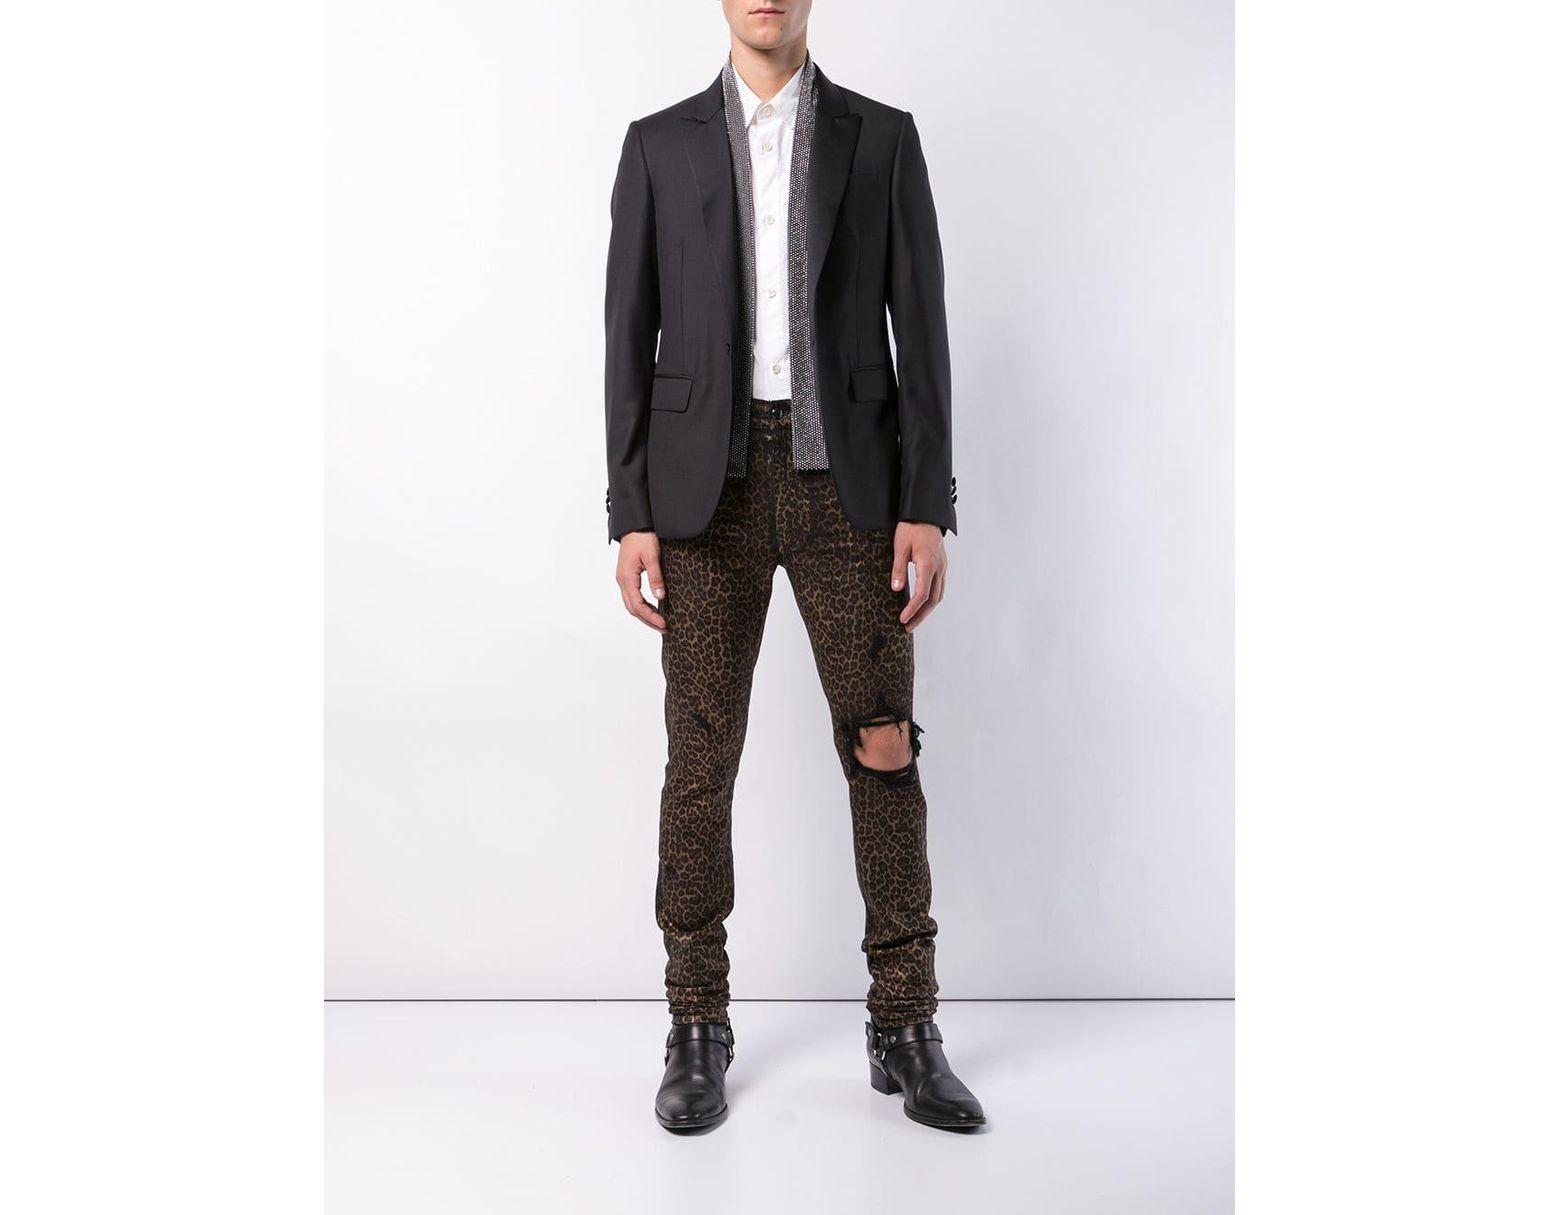 b48cda37868e Amiri Leopard Print Jeans in Black for Men - Lyst